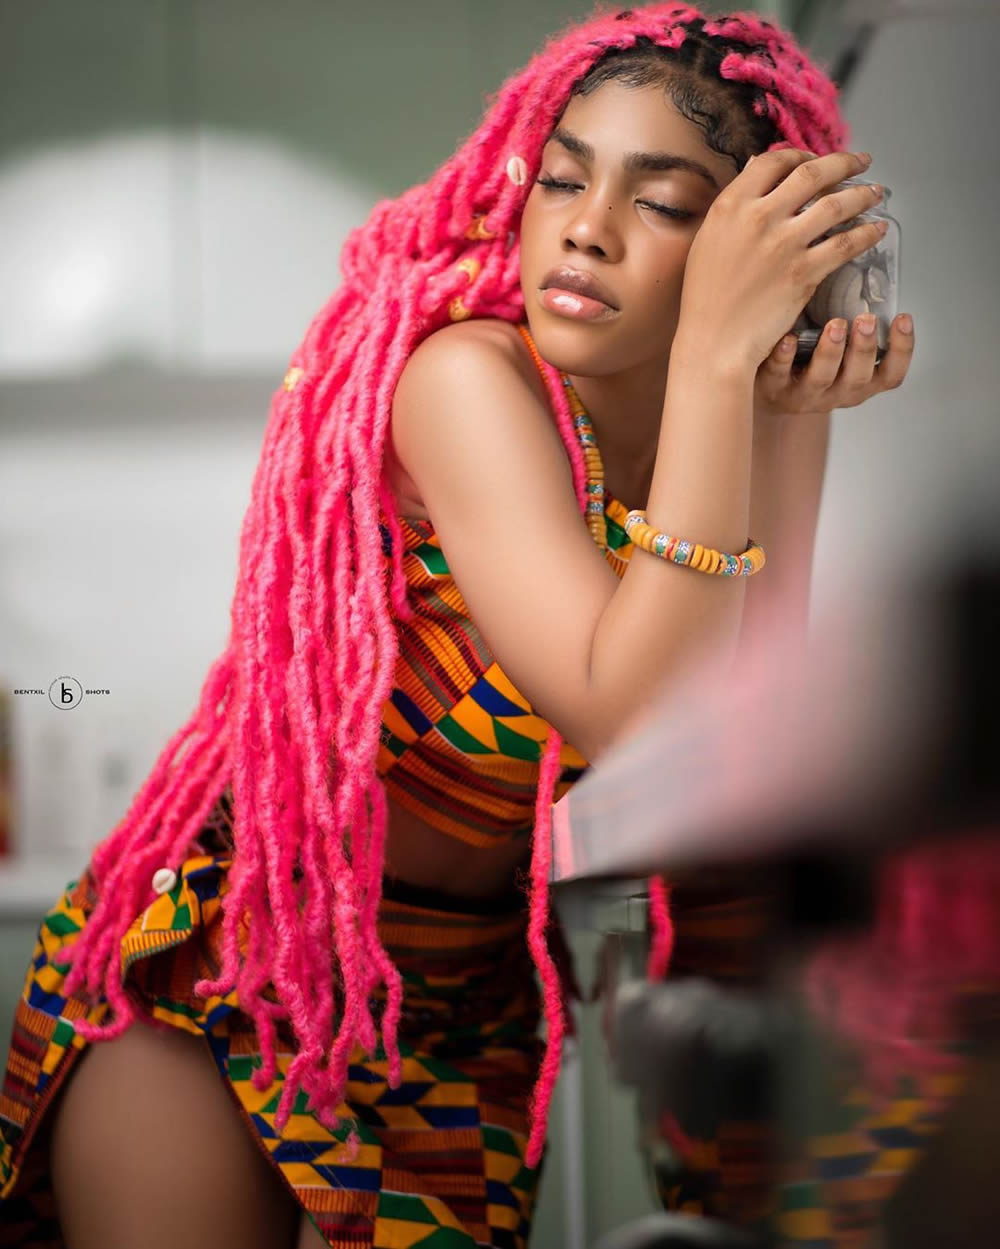 Hot Shots Of Two African Beauties In Kente Prints Fashion